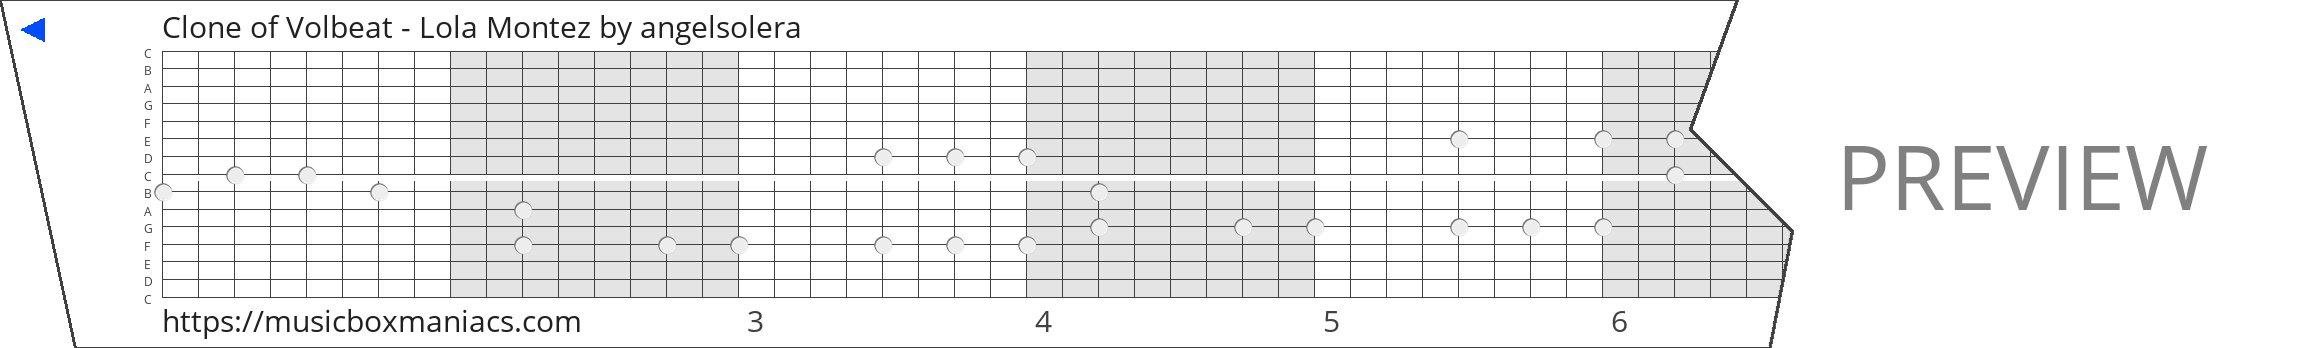 Clone of Volbeat - Lola Montez 15 note music box paper strip